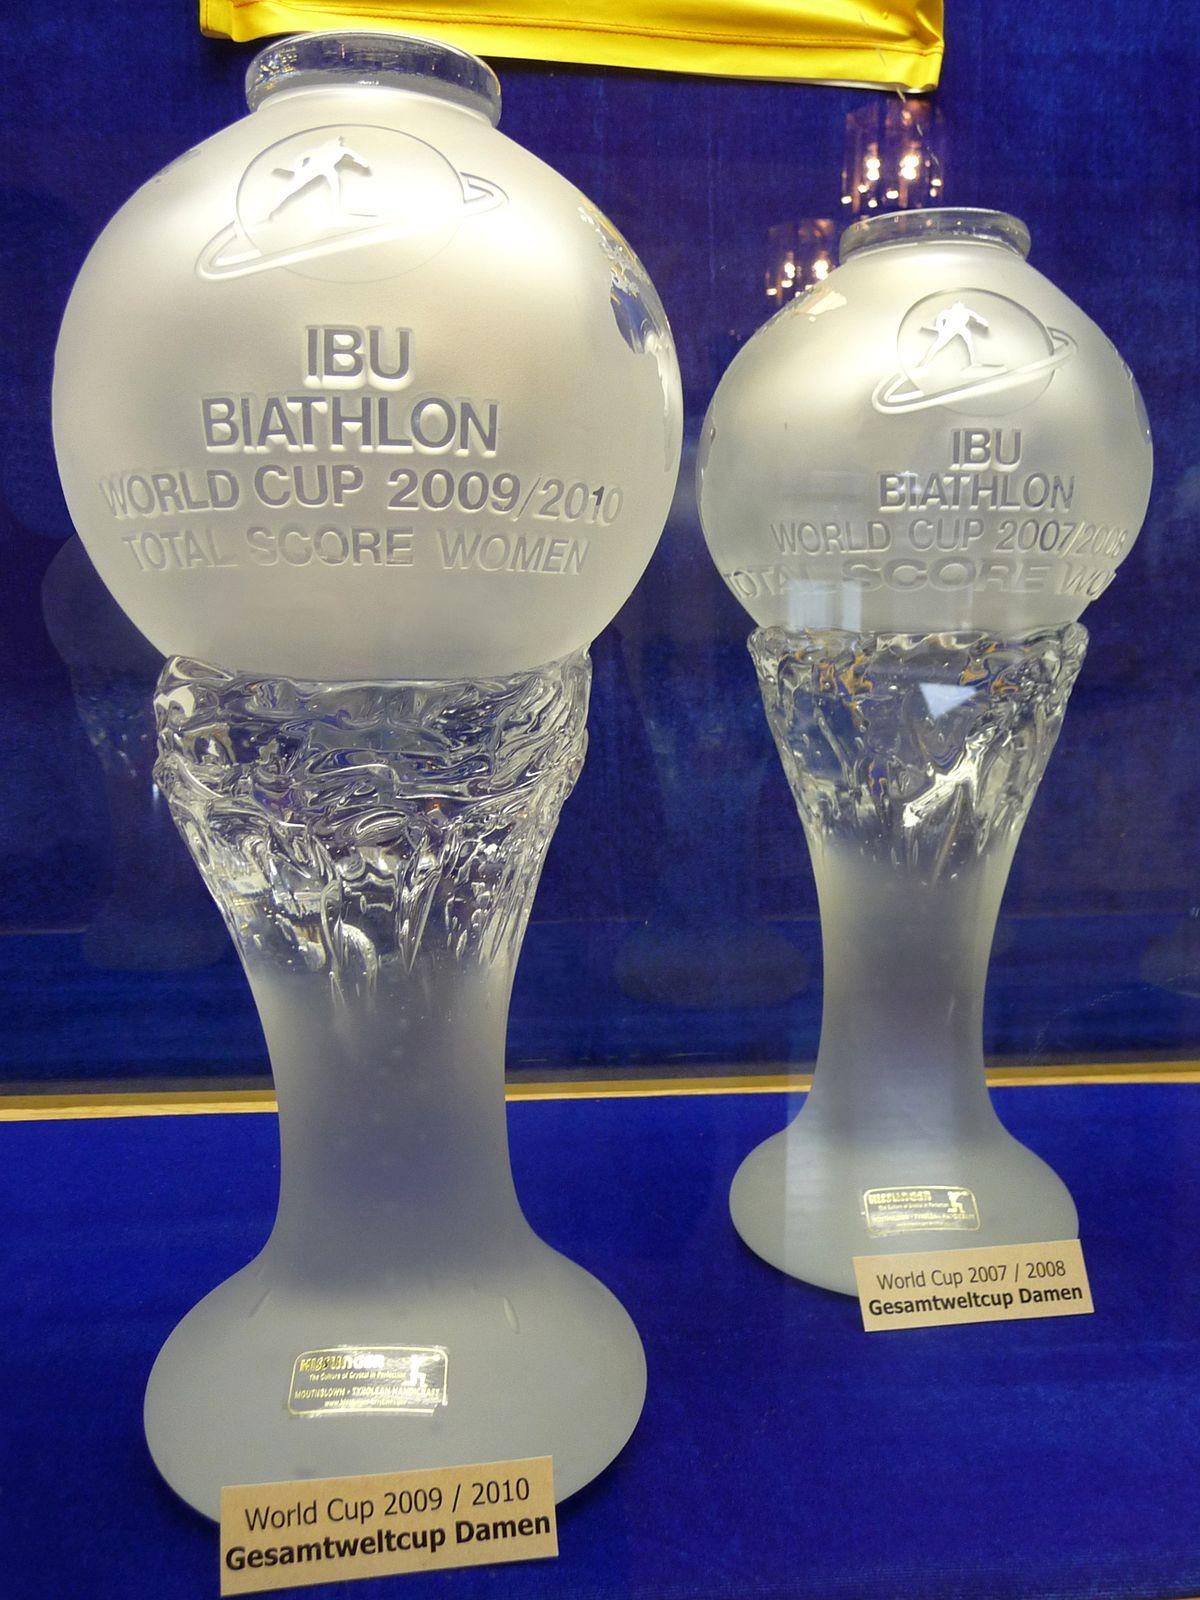 Globe de cristal biathlon wikip dia - Classement coupe du monde de biathlon ...